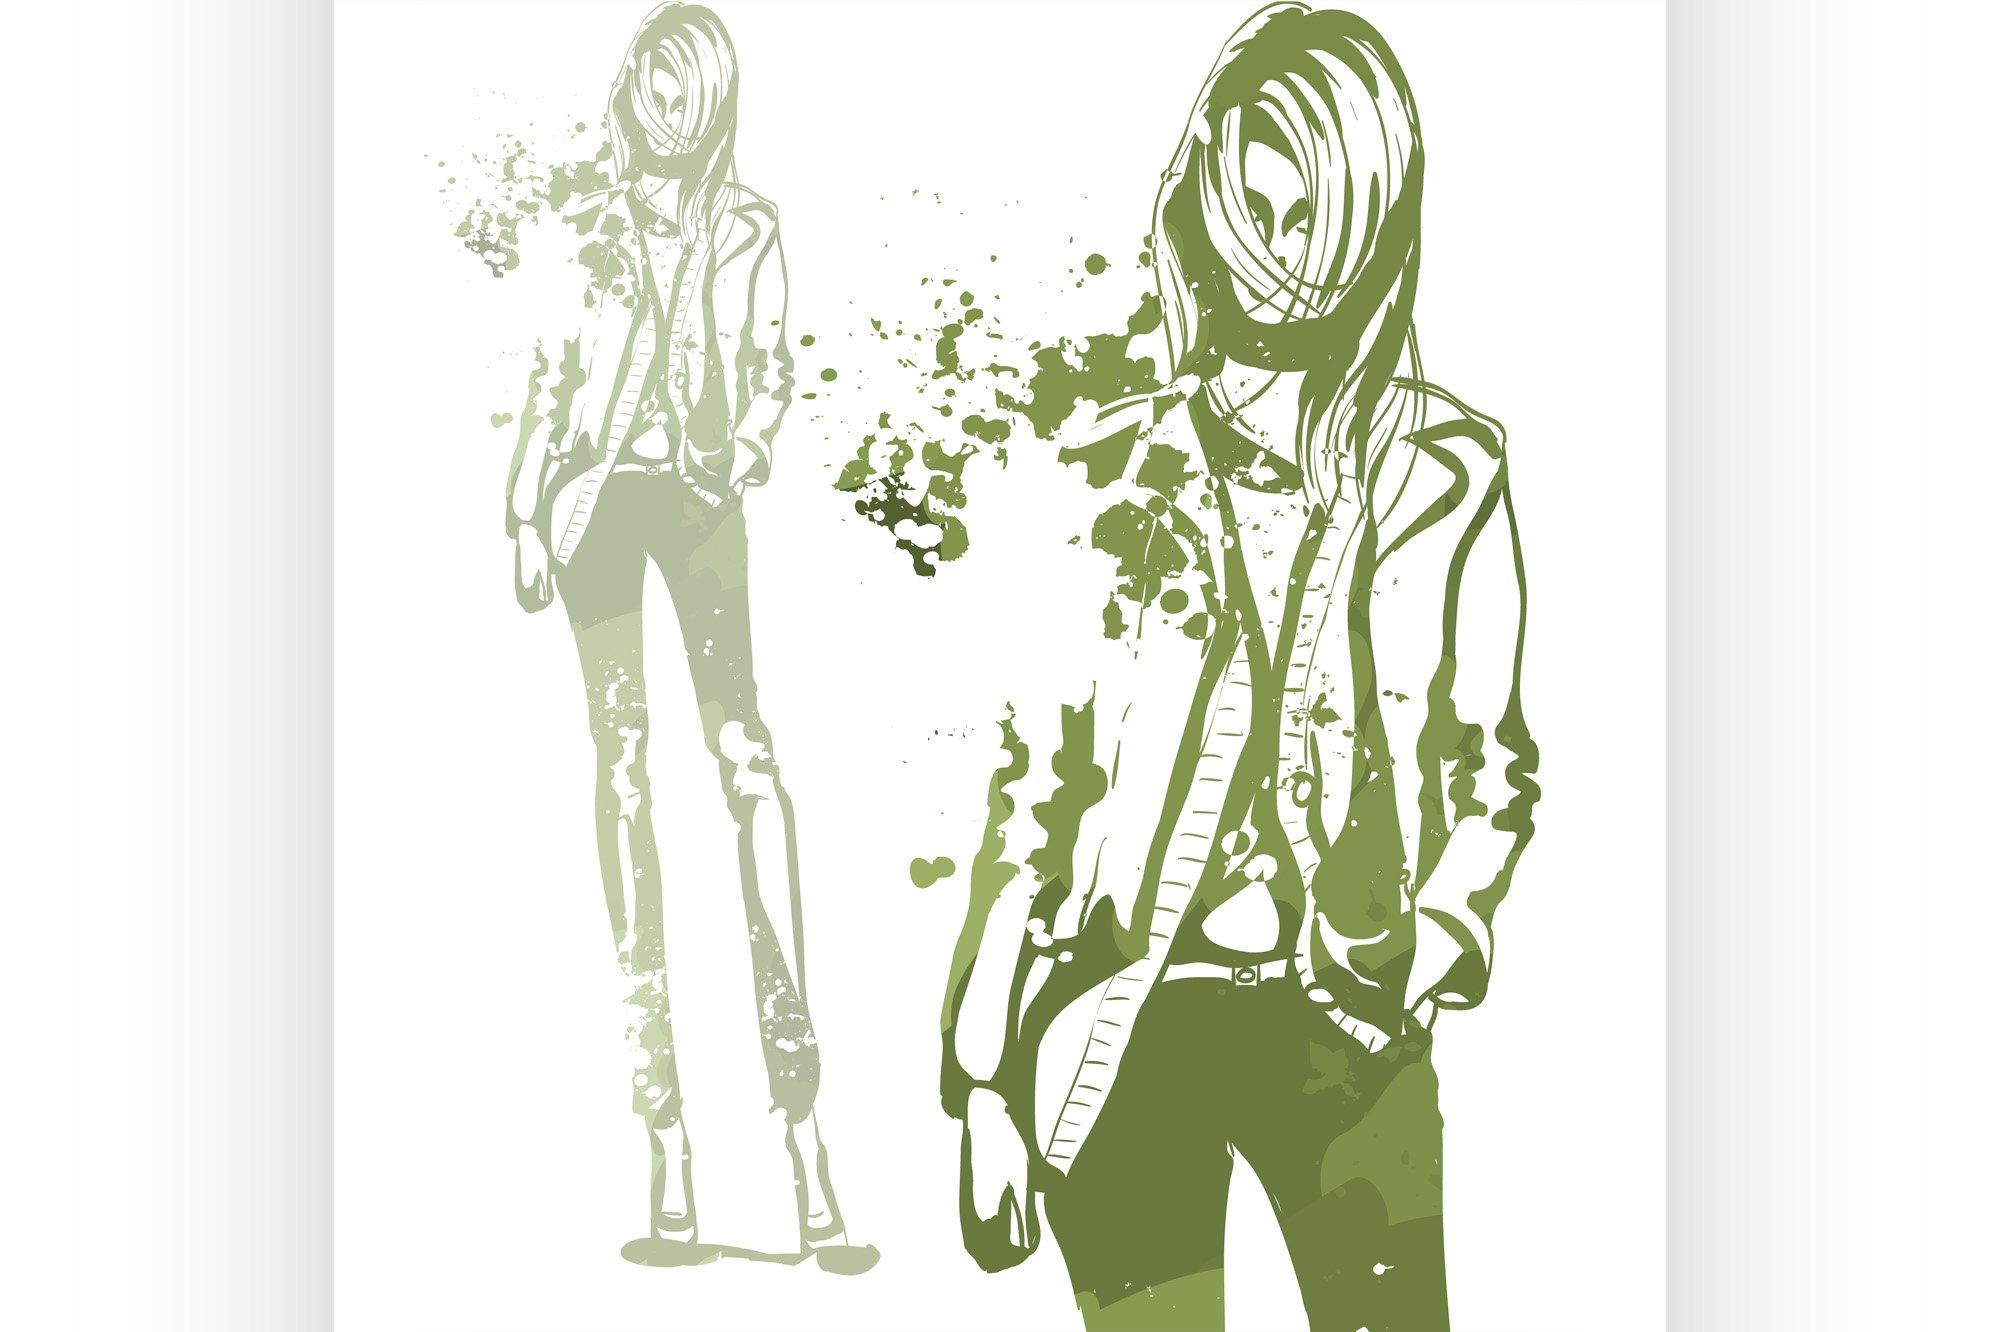 Portrait of trendy look girl example image 1